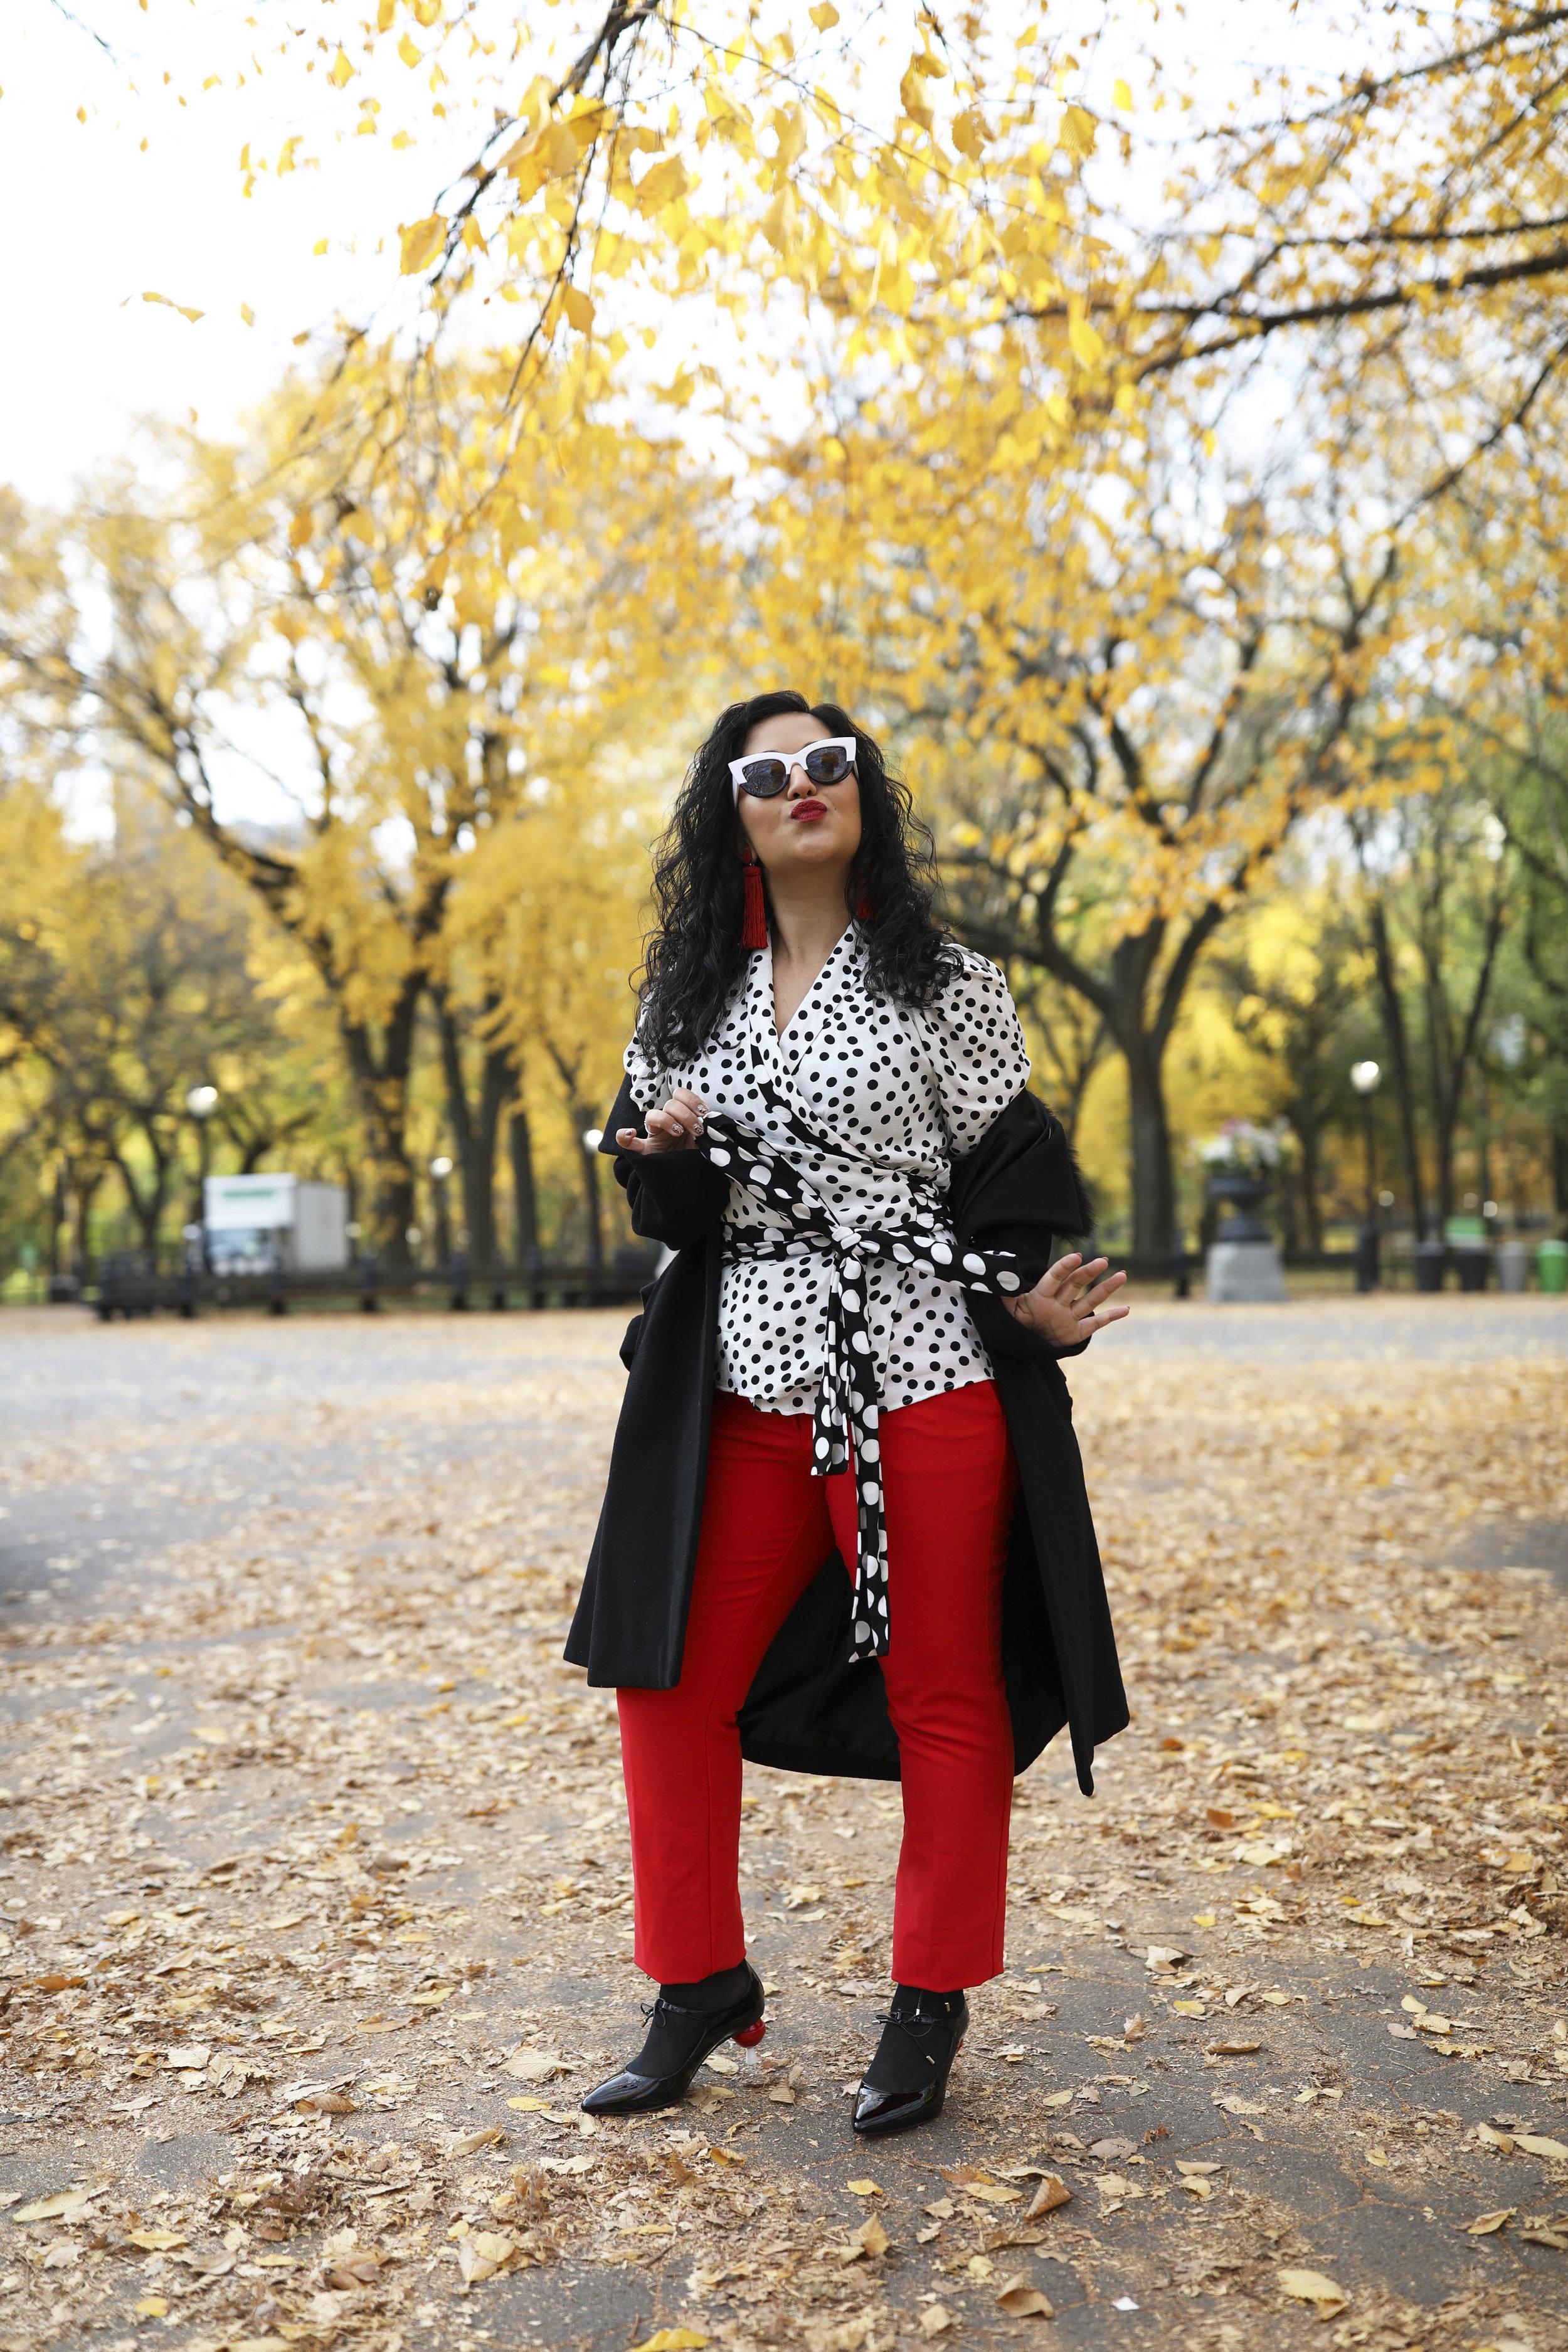 Krity S x Fall Work Outfit x Polka Dot5.jpg